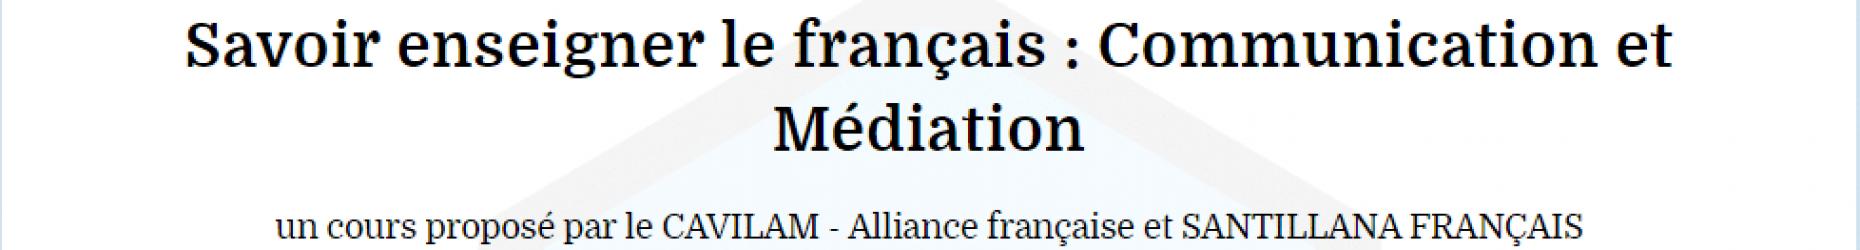 Certificat Cavilam La French Frog